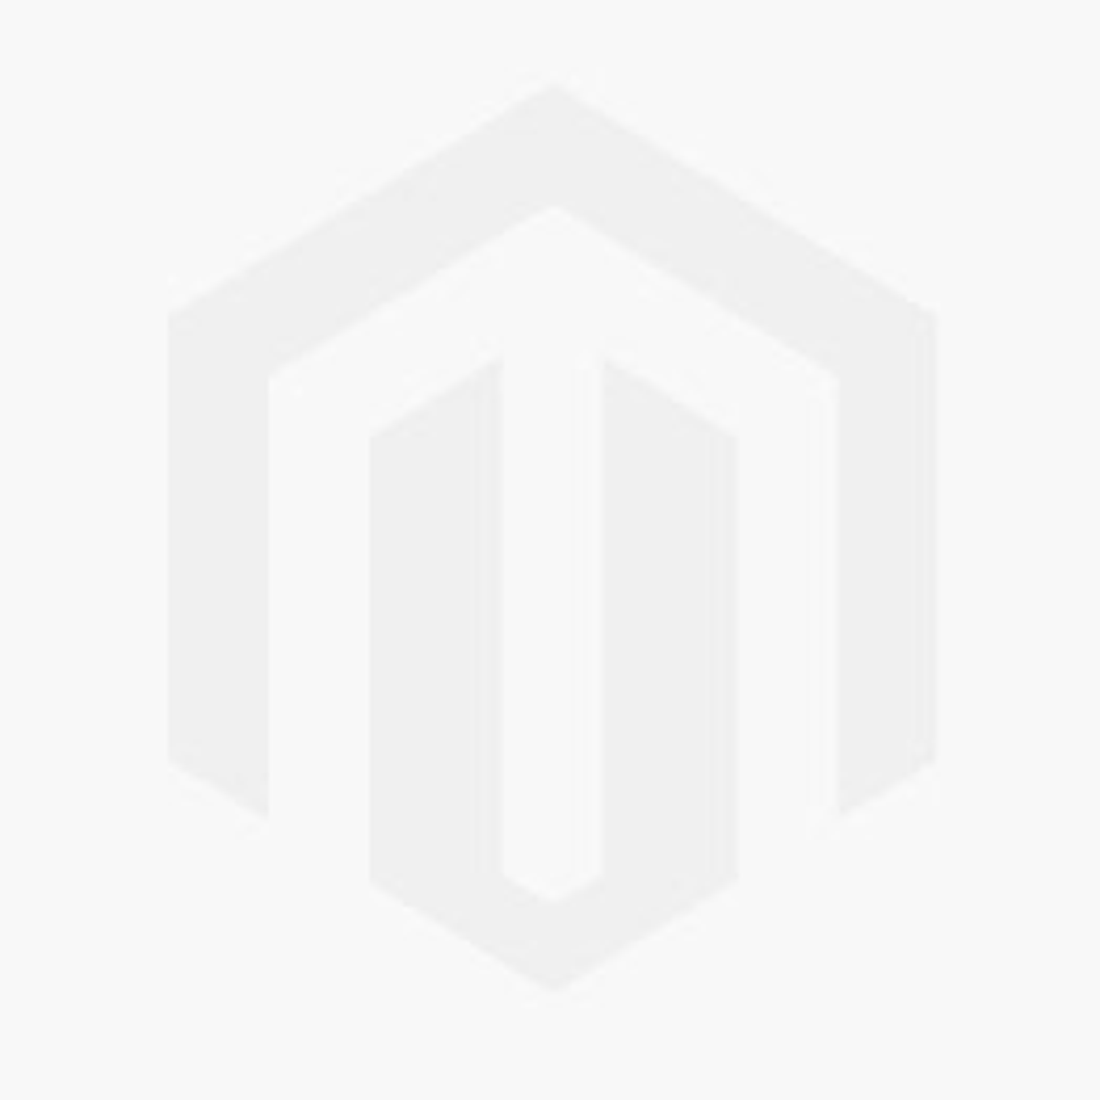 Greetings Card Harrison-Jeive The Girls